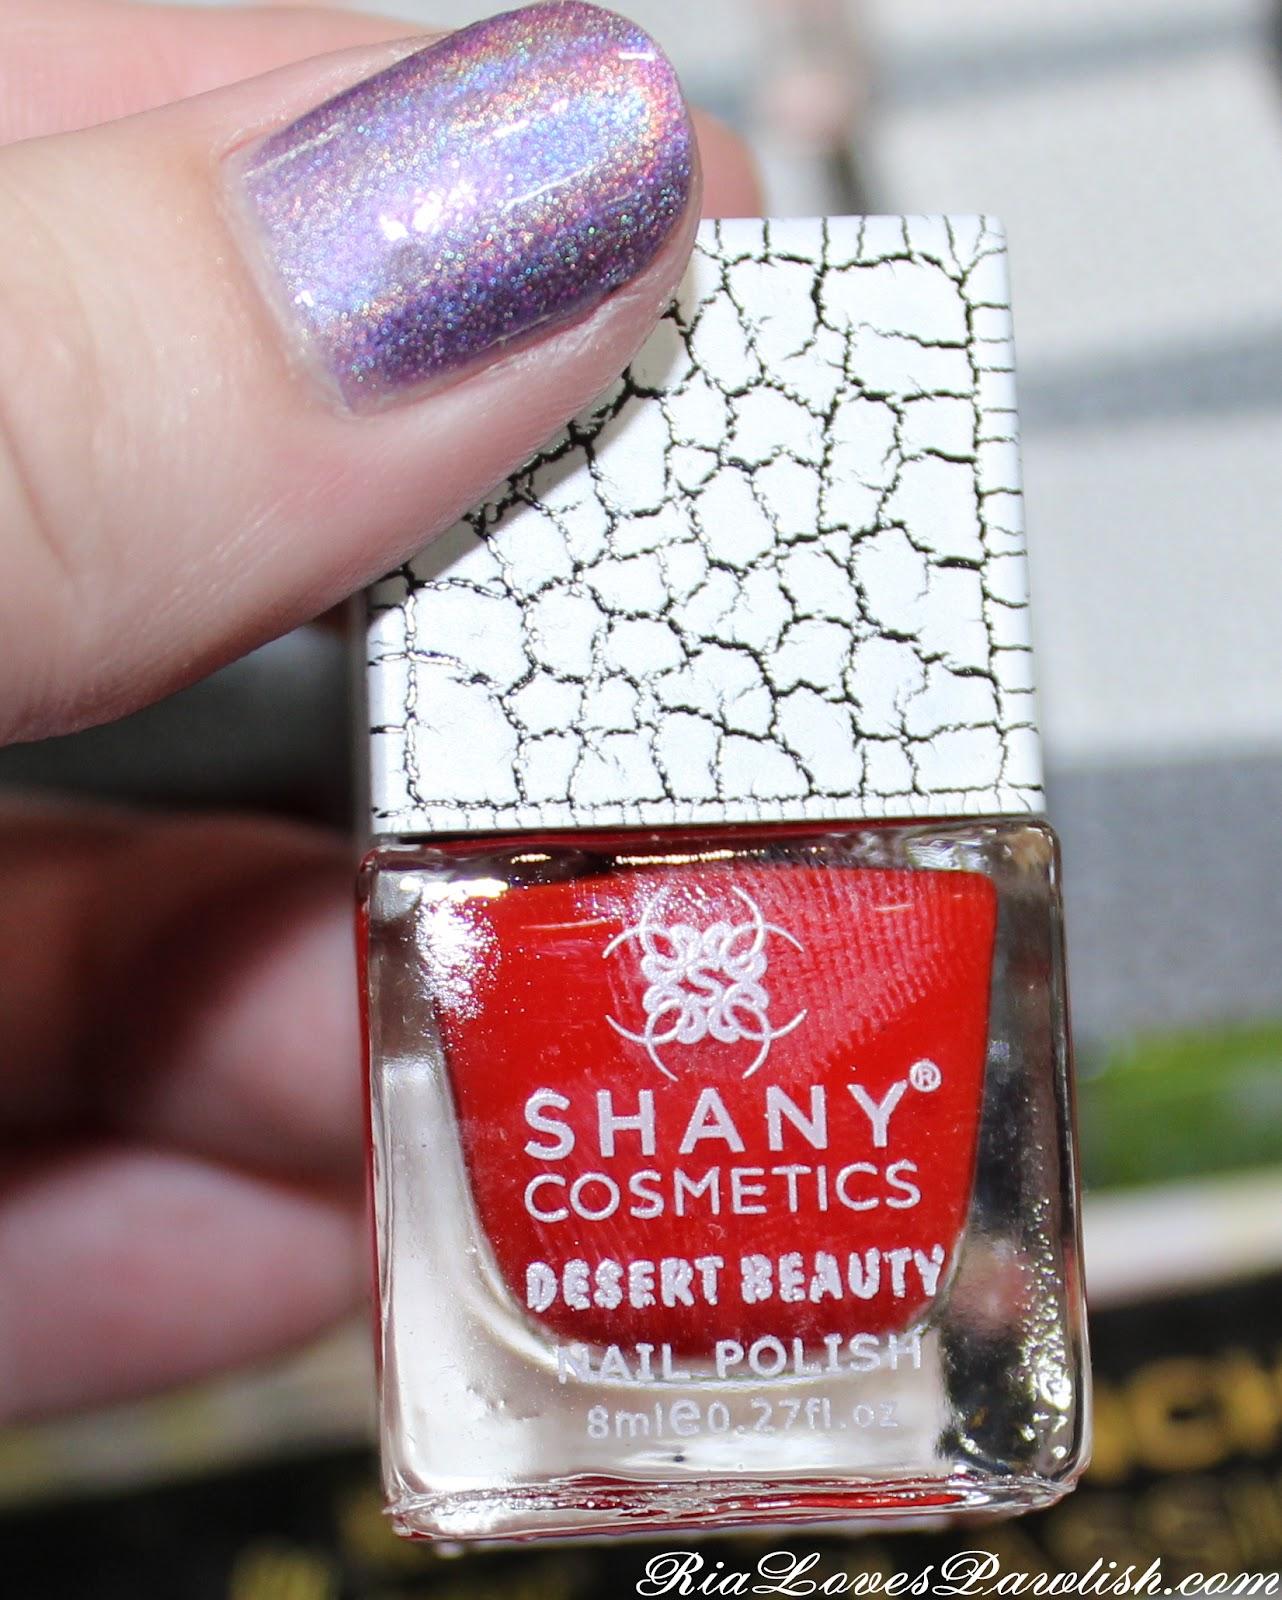 Ria Loves Pawlish: Cosmoprof 2012... Shany Cosmetics